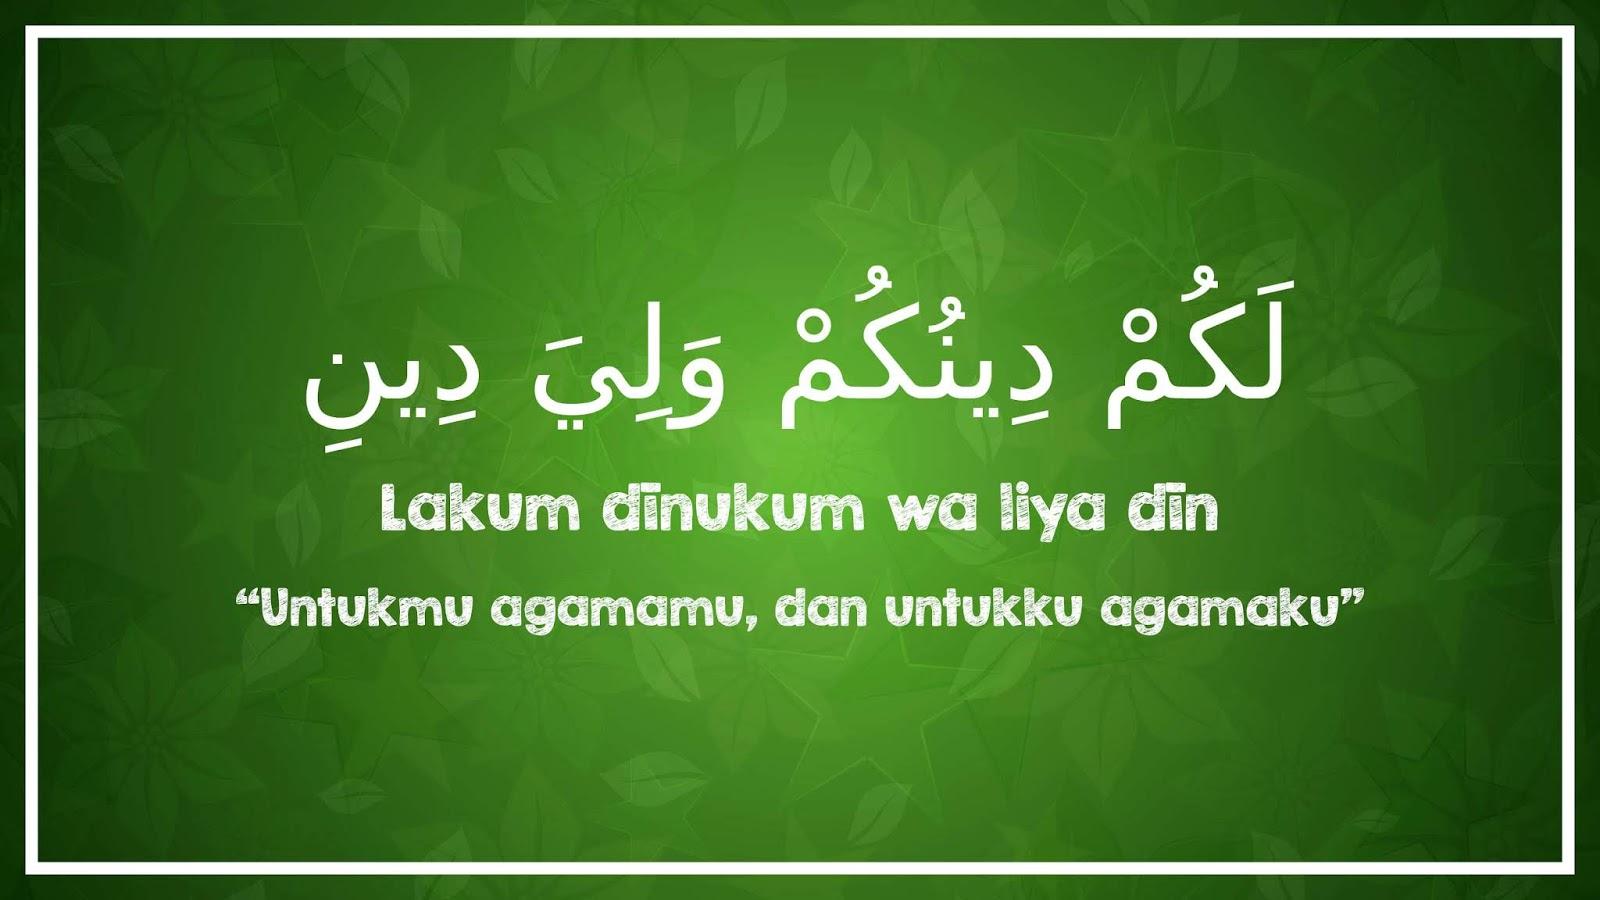 Bagimu Agamamu Bagiku Agamaku bimbingan islam